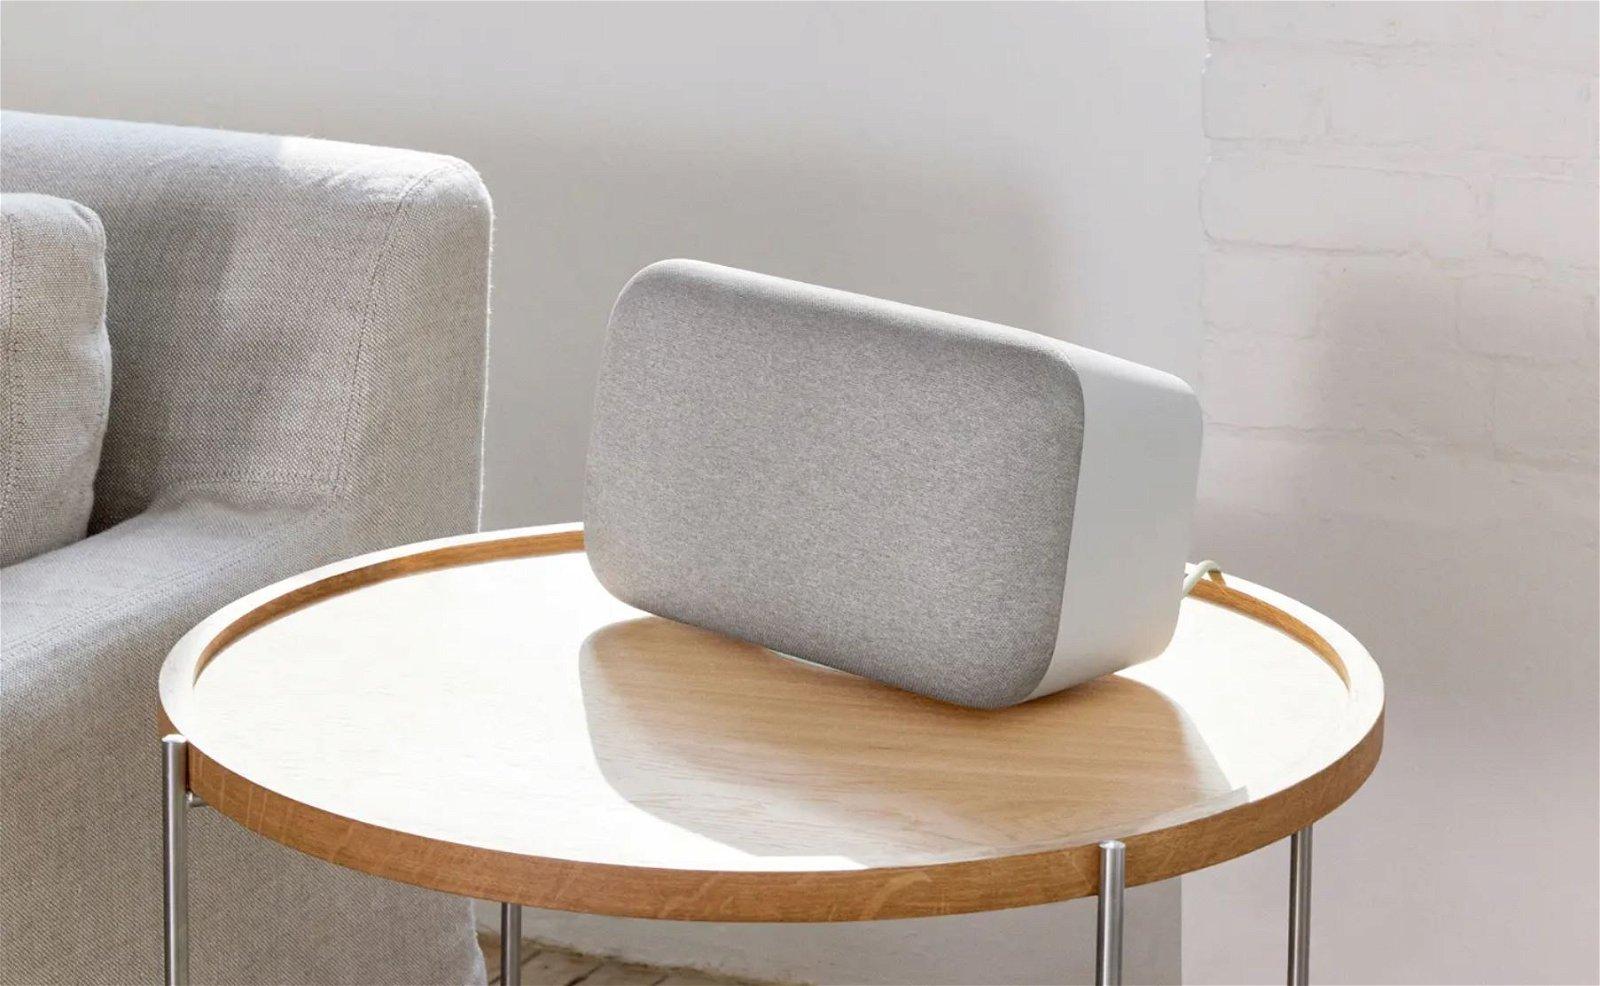 Google Reveals Pixel Buds, Nest Wifi, Google Home Max 2